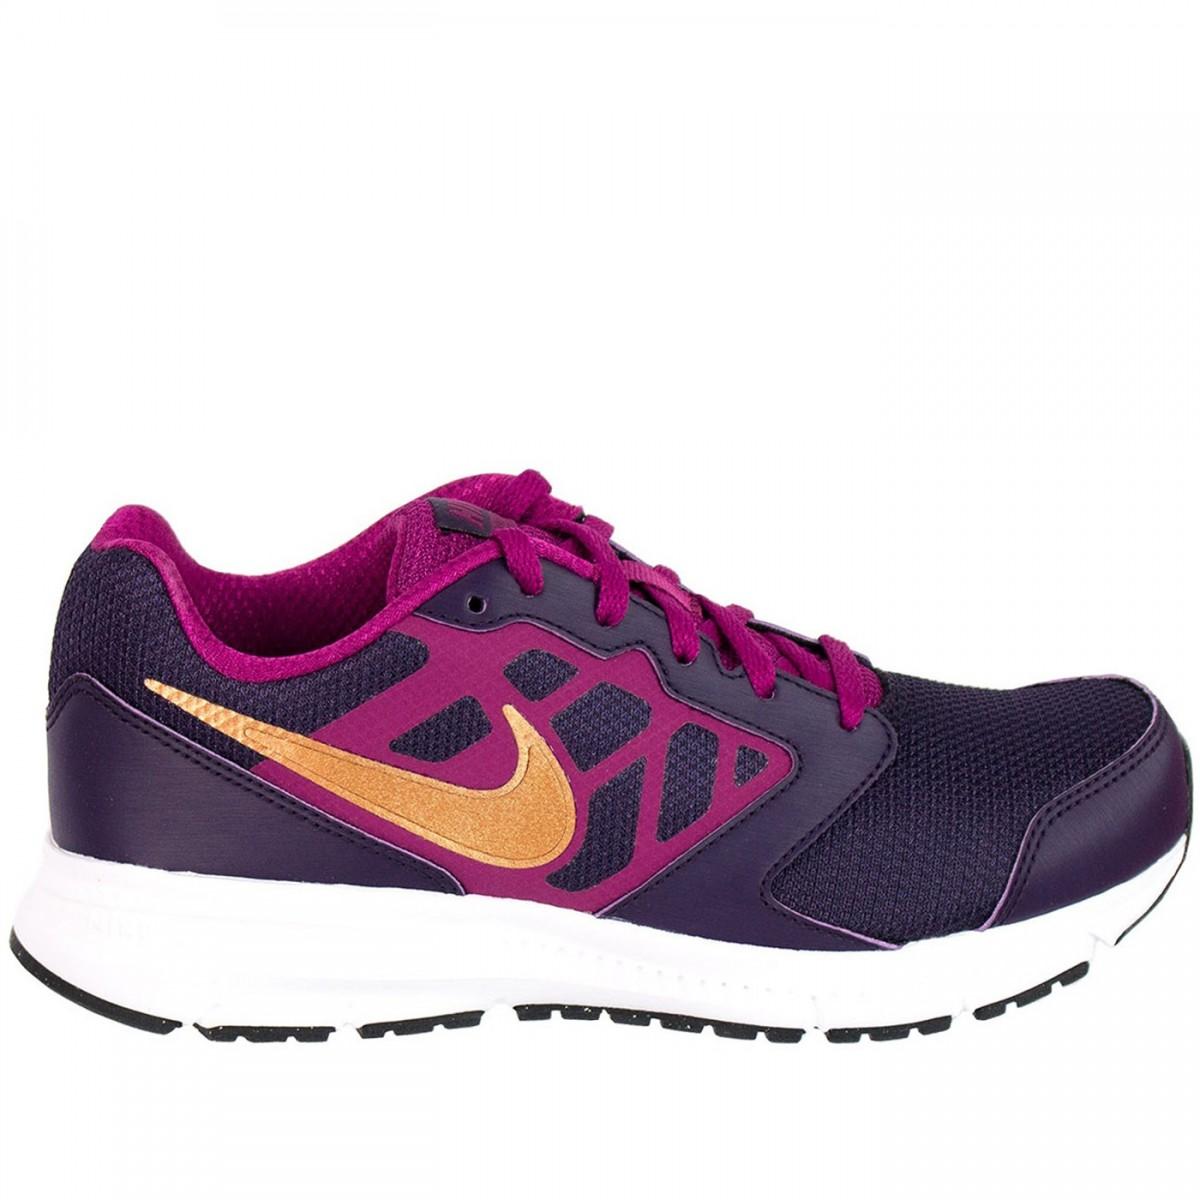 72fda4c1338 Bizz Store - Tênis Infantil Feminino Nike Downshifter 6 Corrida